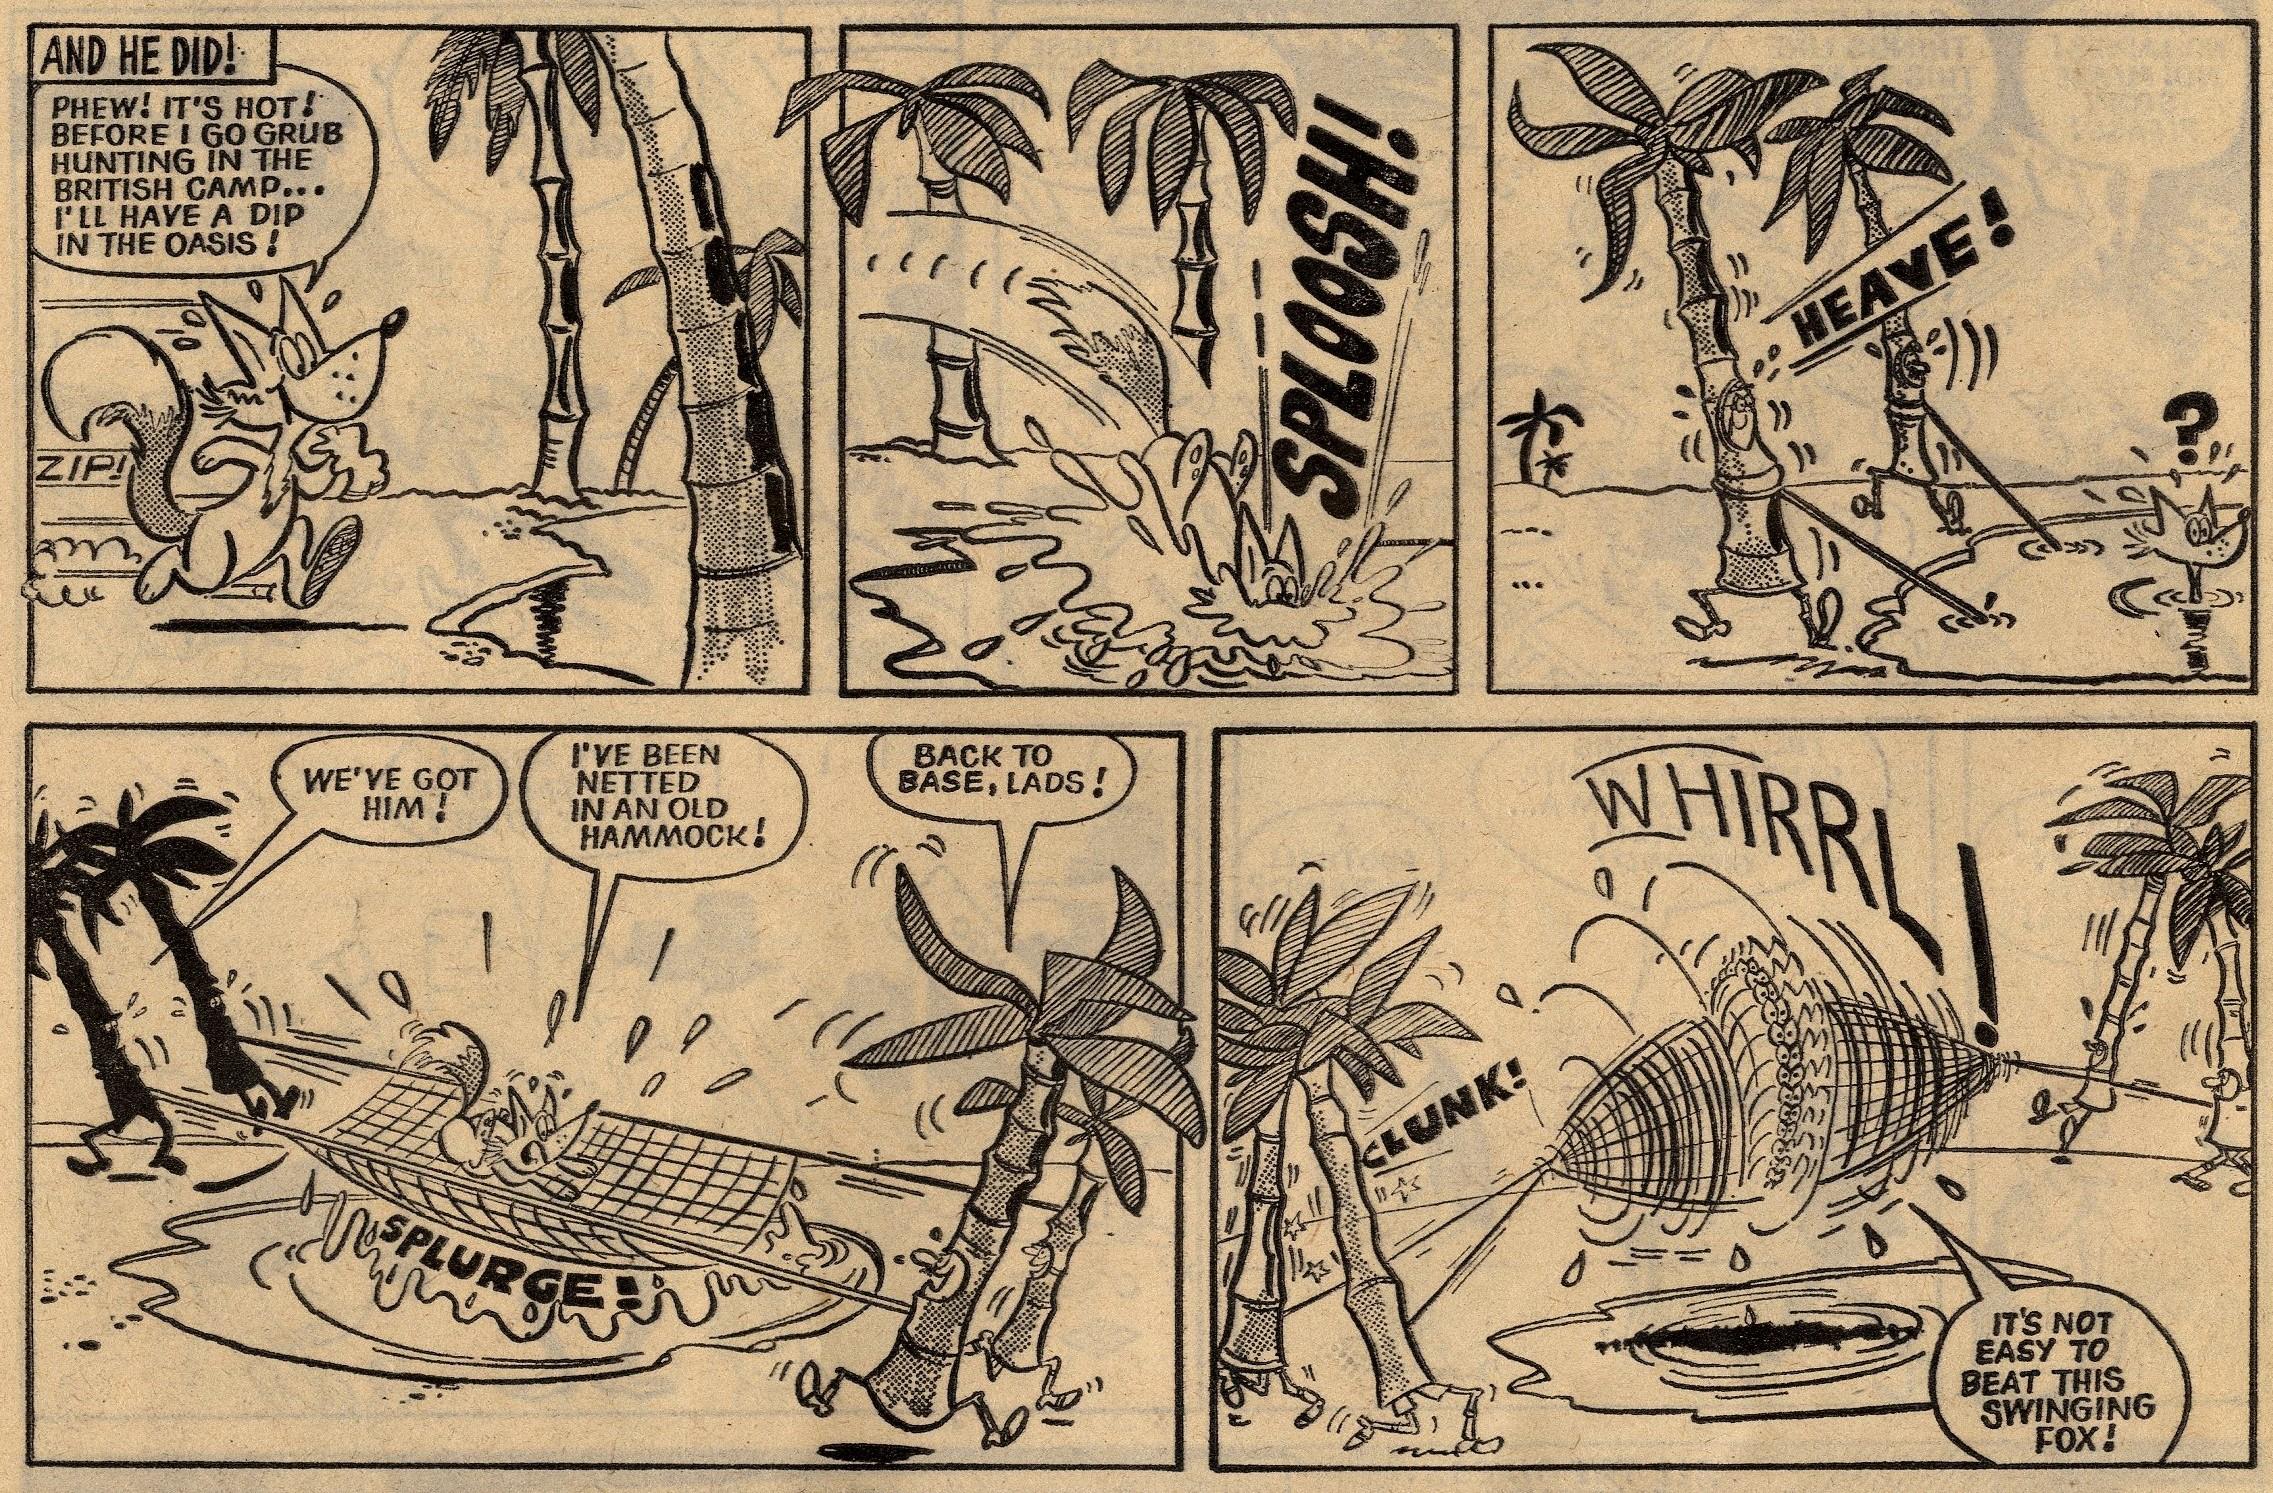 The Desert Fox: Terry Bave (artist)